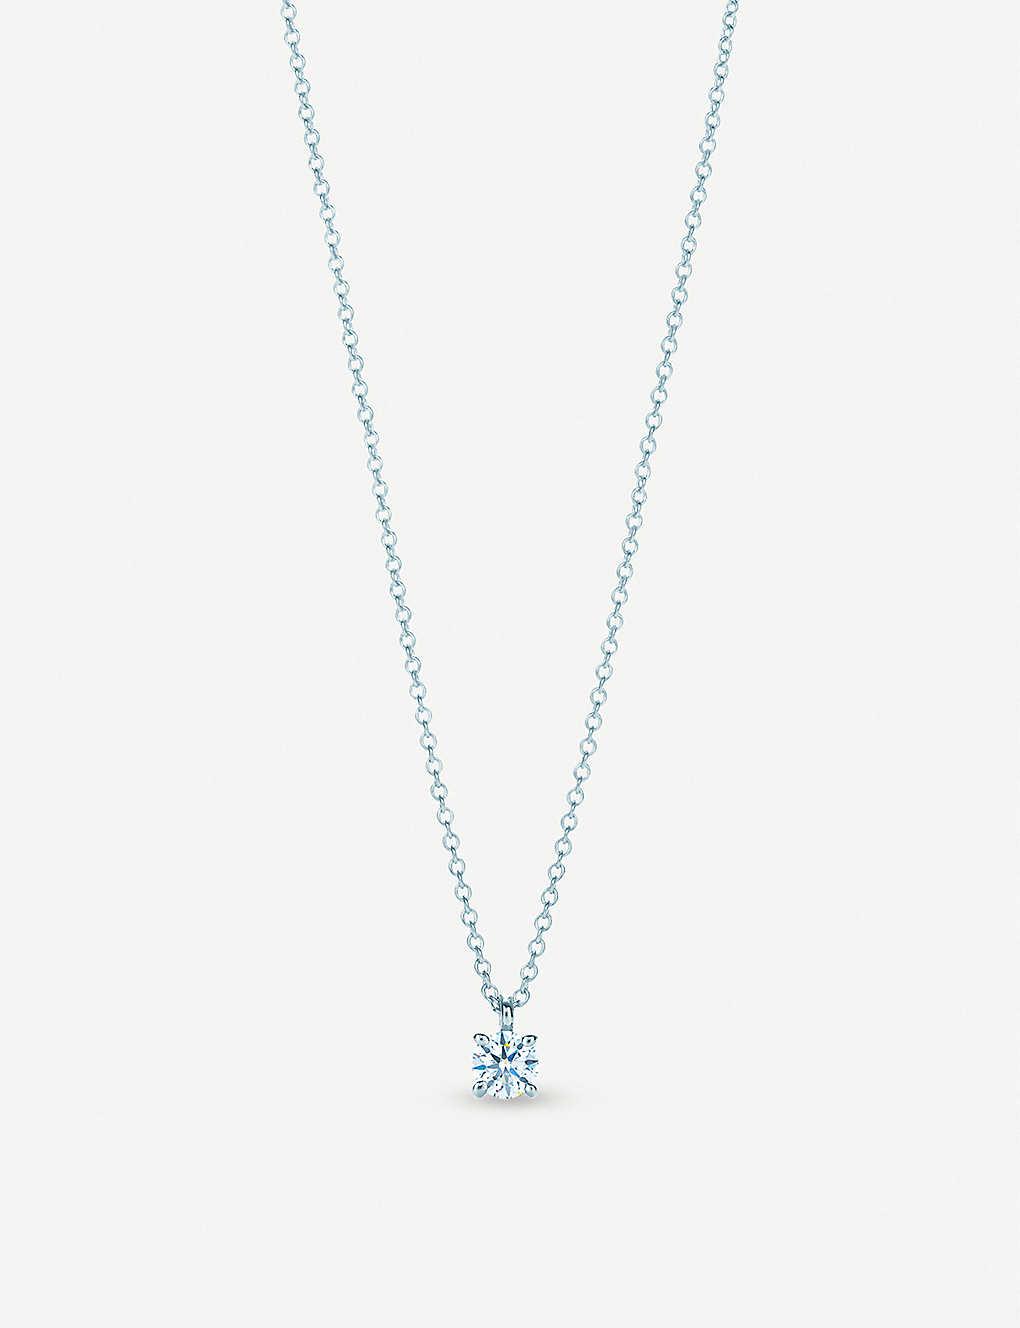 ec2a76936 TIFFANY & CO - Platinum and solitaire diamond pendant necklace ...